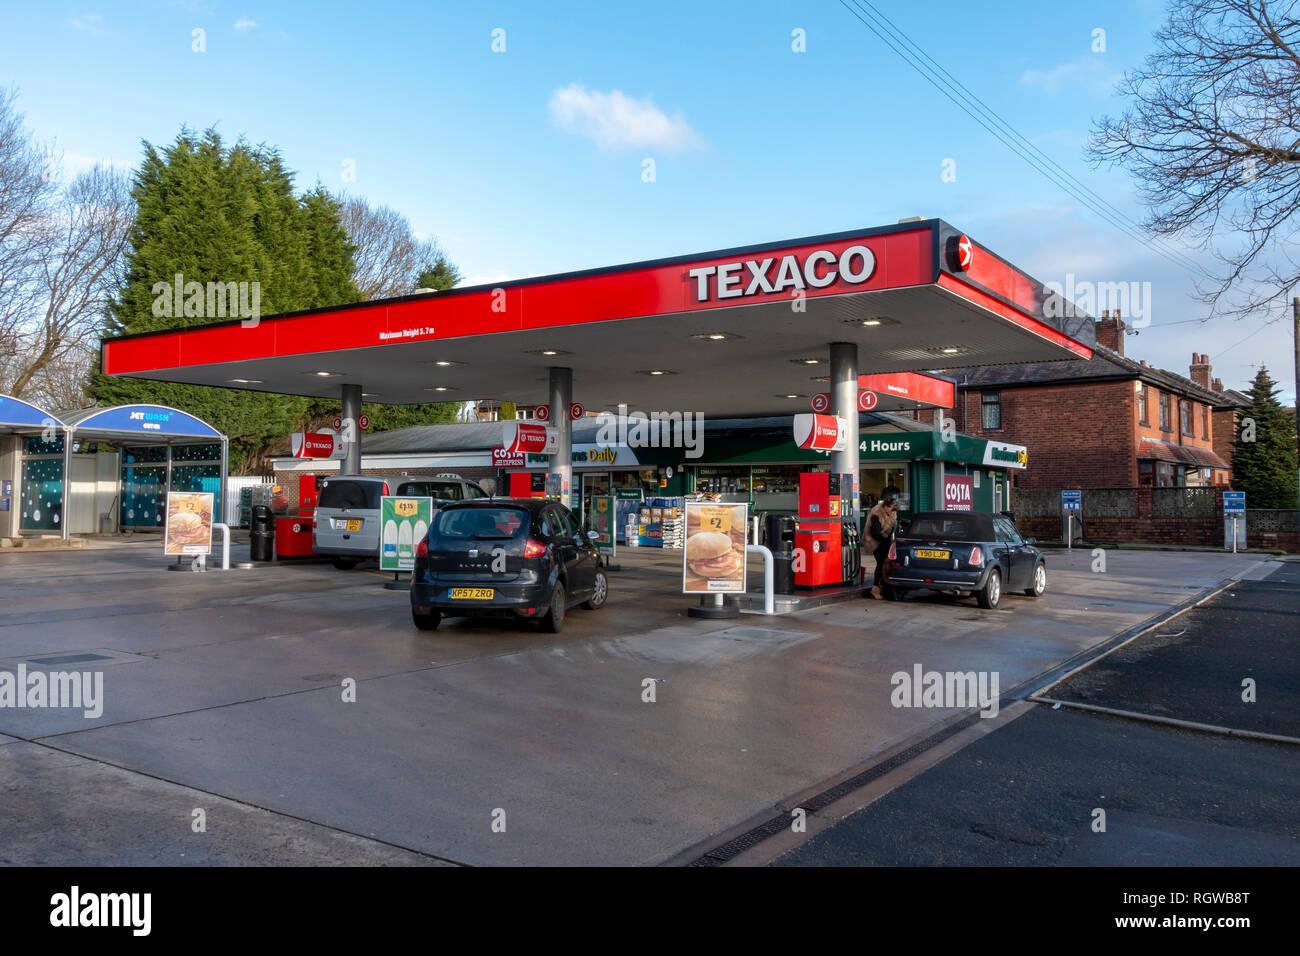 Texaco fuel station forecourt in Bury, Lancashire - Stock Image